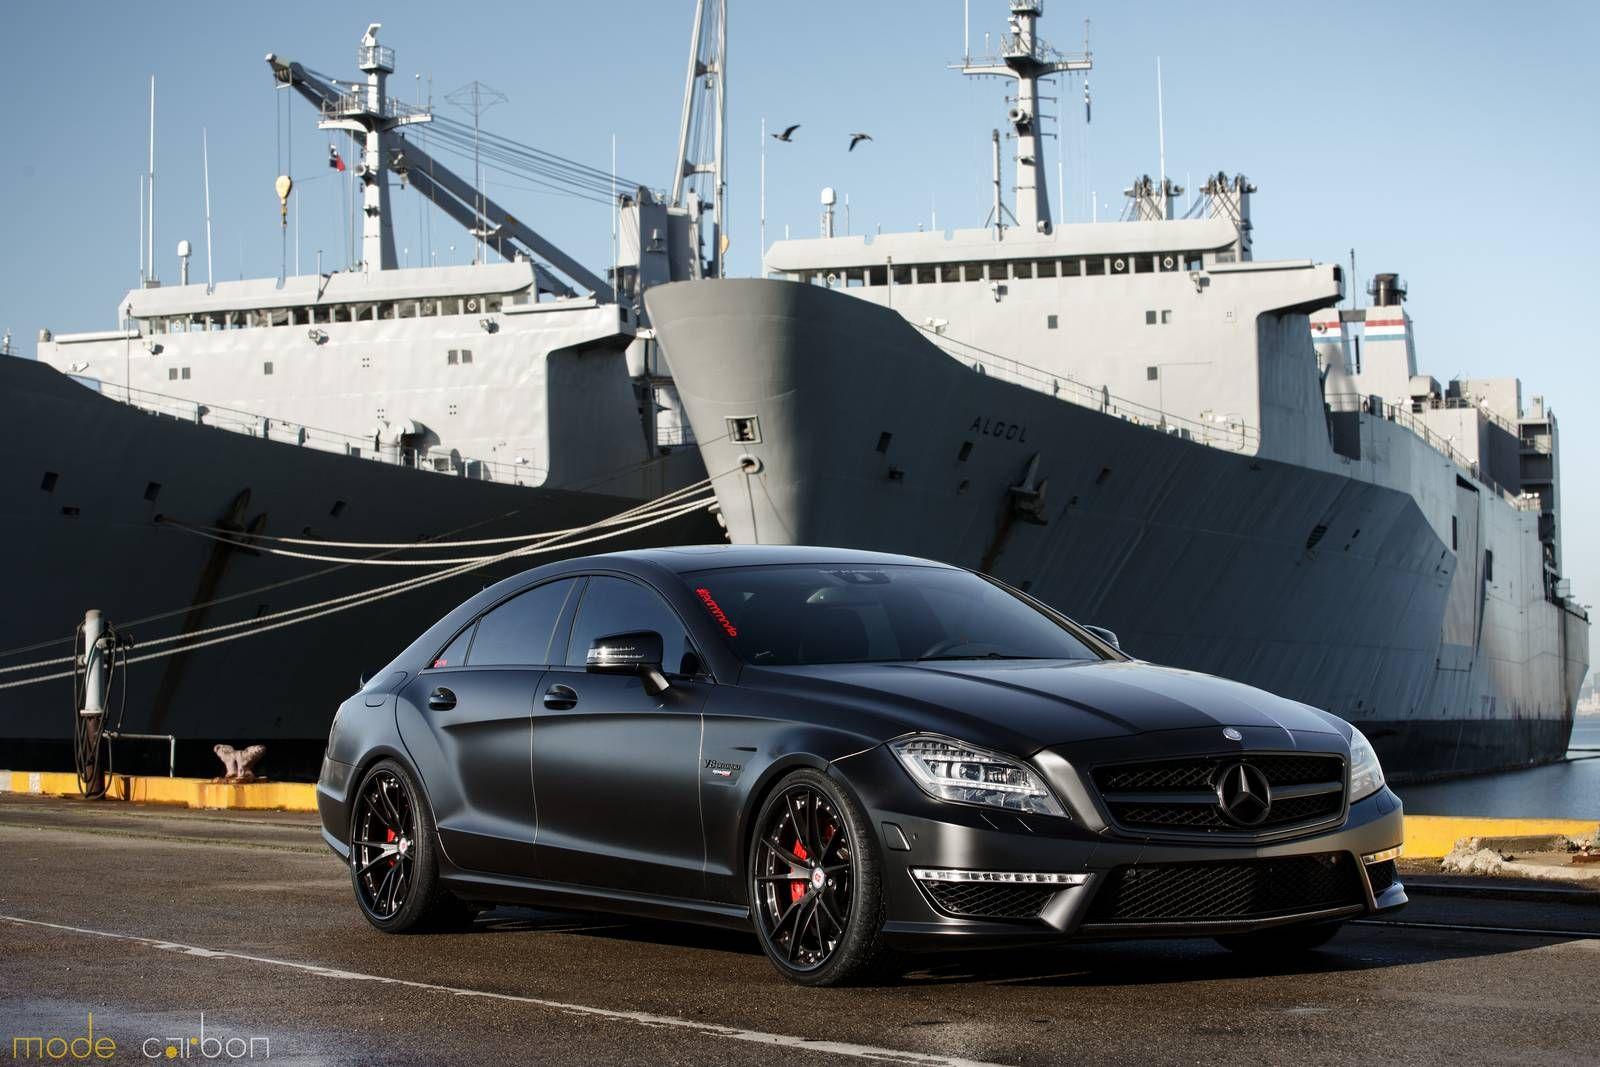 Matte Black Mercedes Benz Cls63 Amg S By Mode Carbon Black Mercedes Benz Mercedes Benz Cls Mercedes Benz